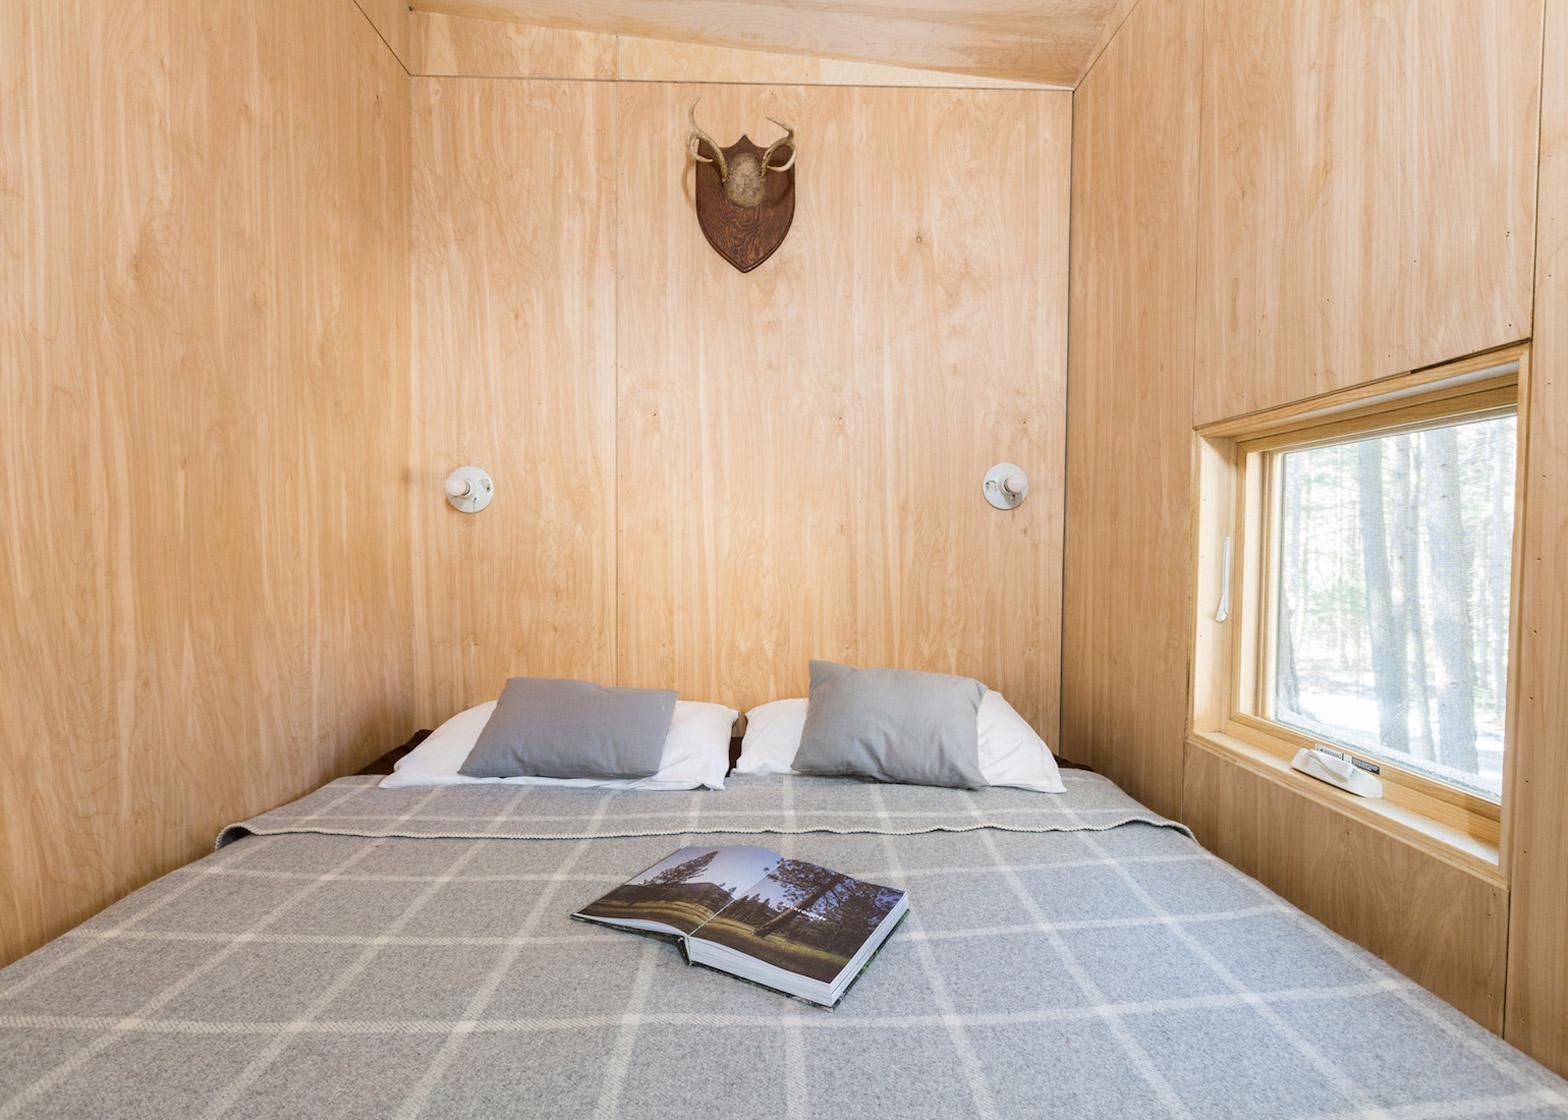 The Lorraine Cabin by Getaway